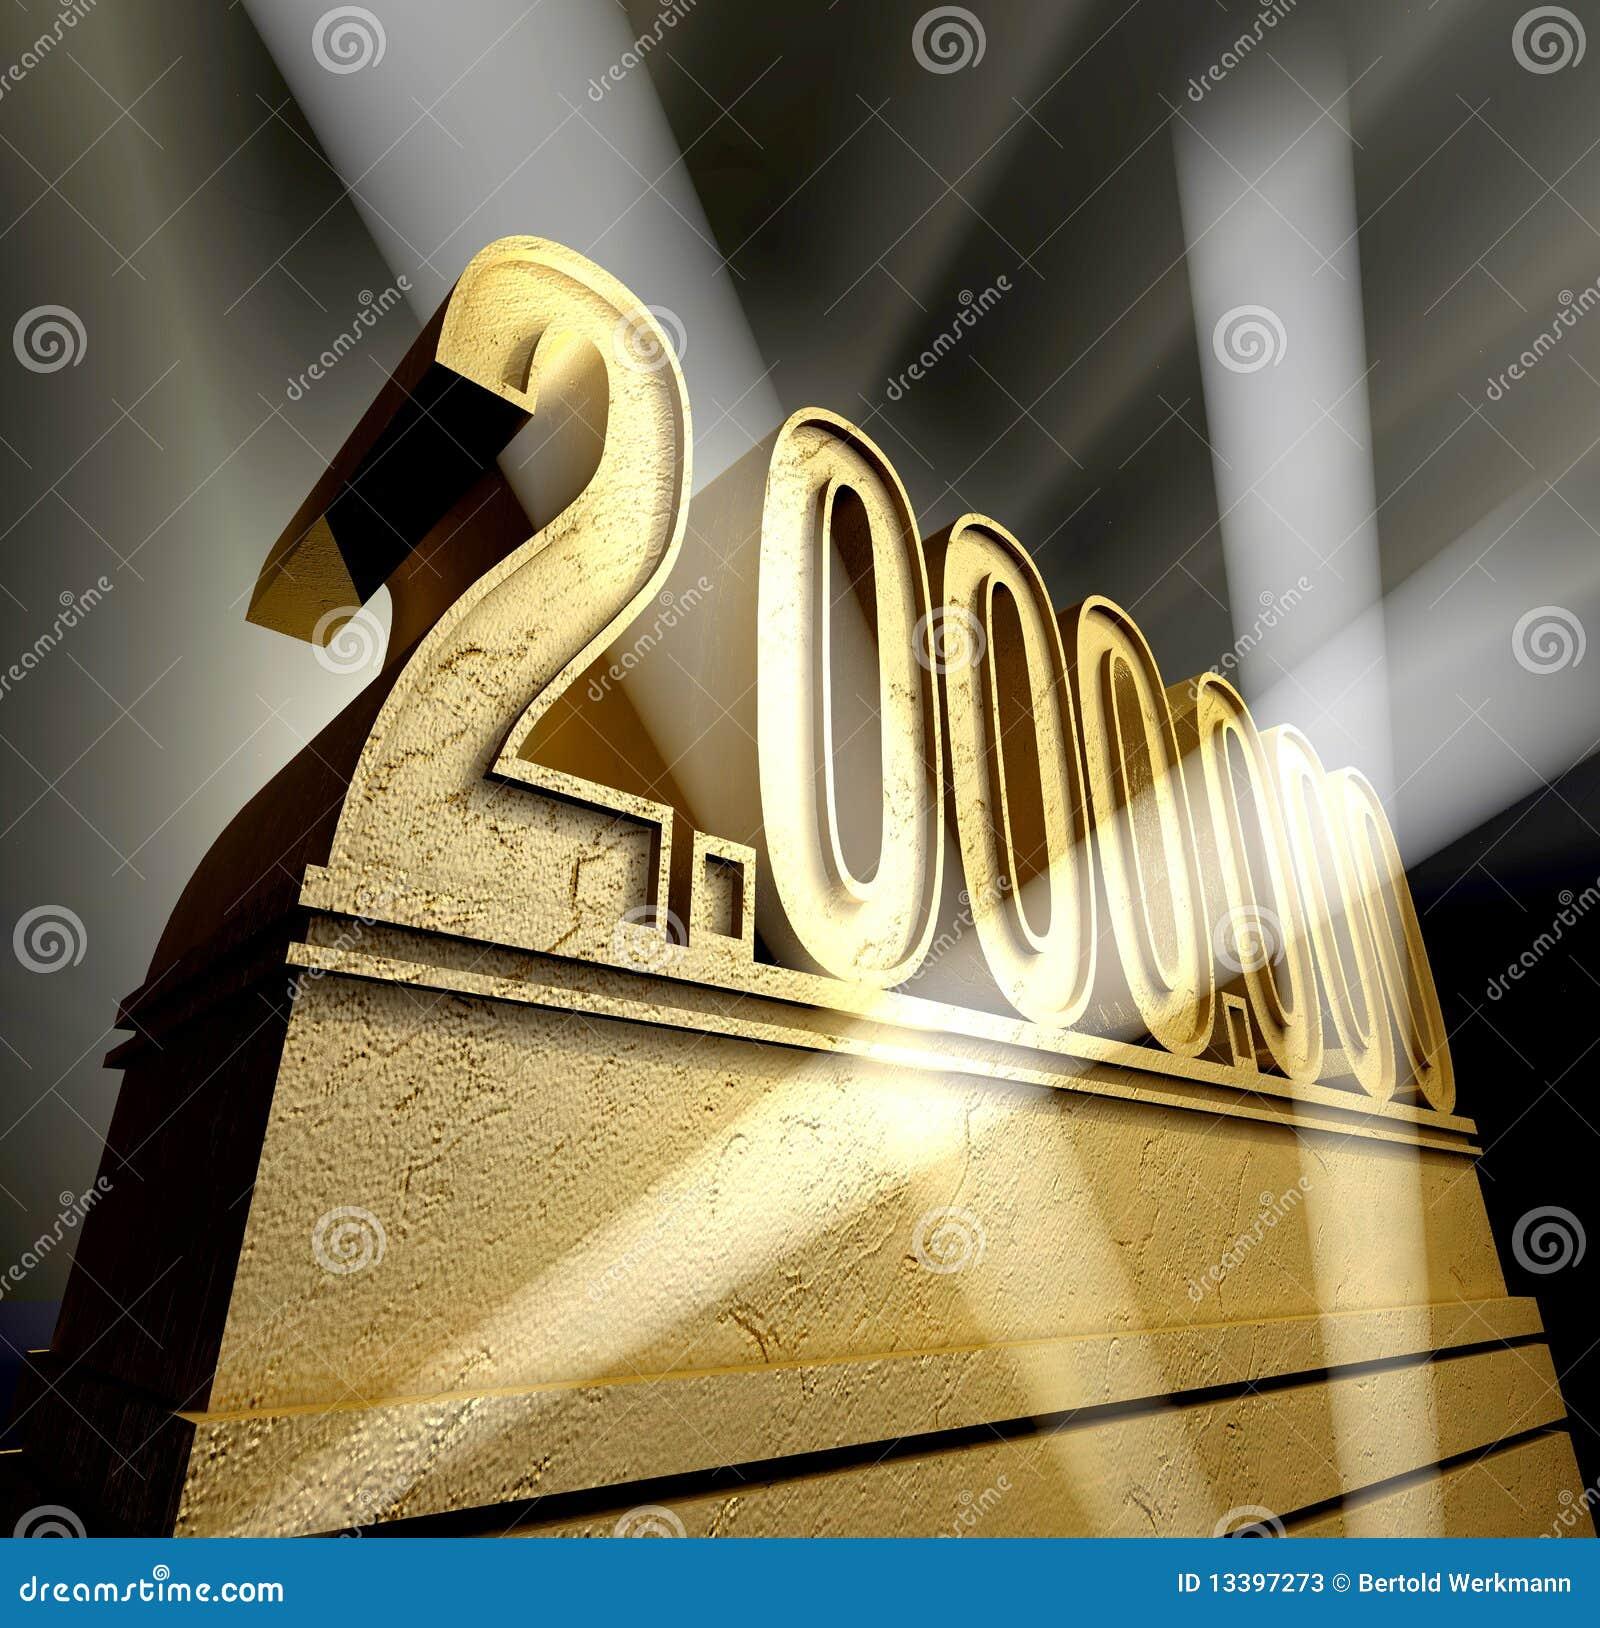 number 2 000 000 stock illustration  illustration of